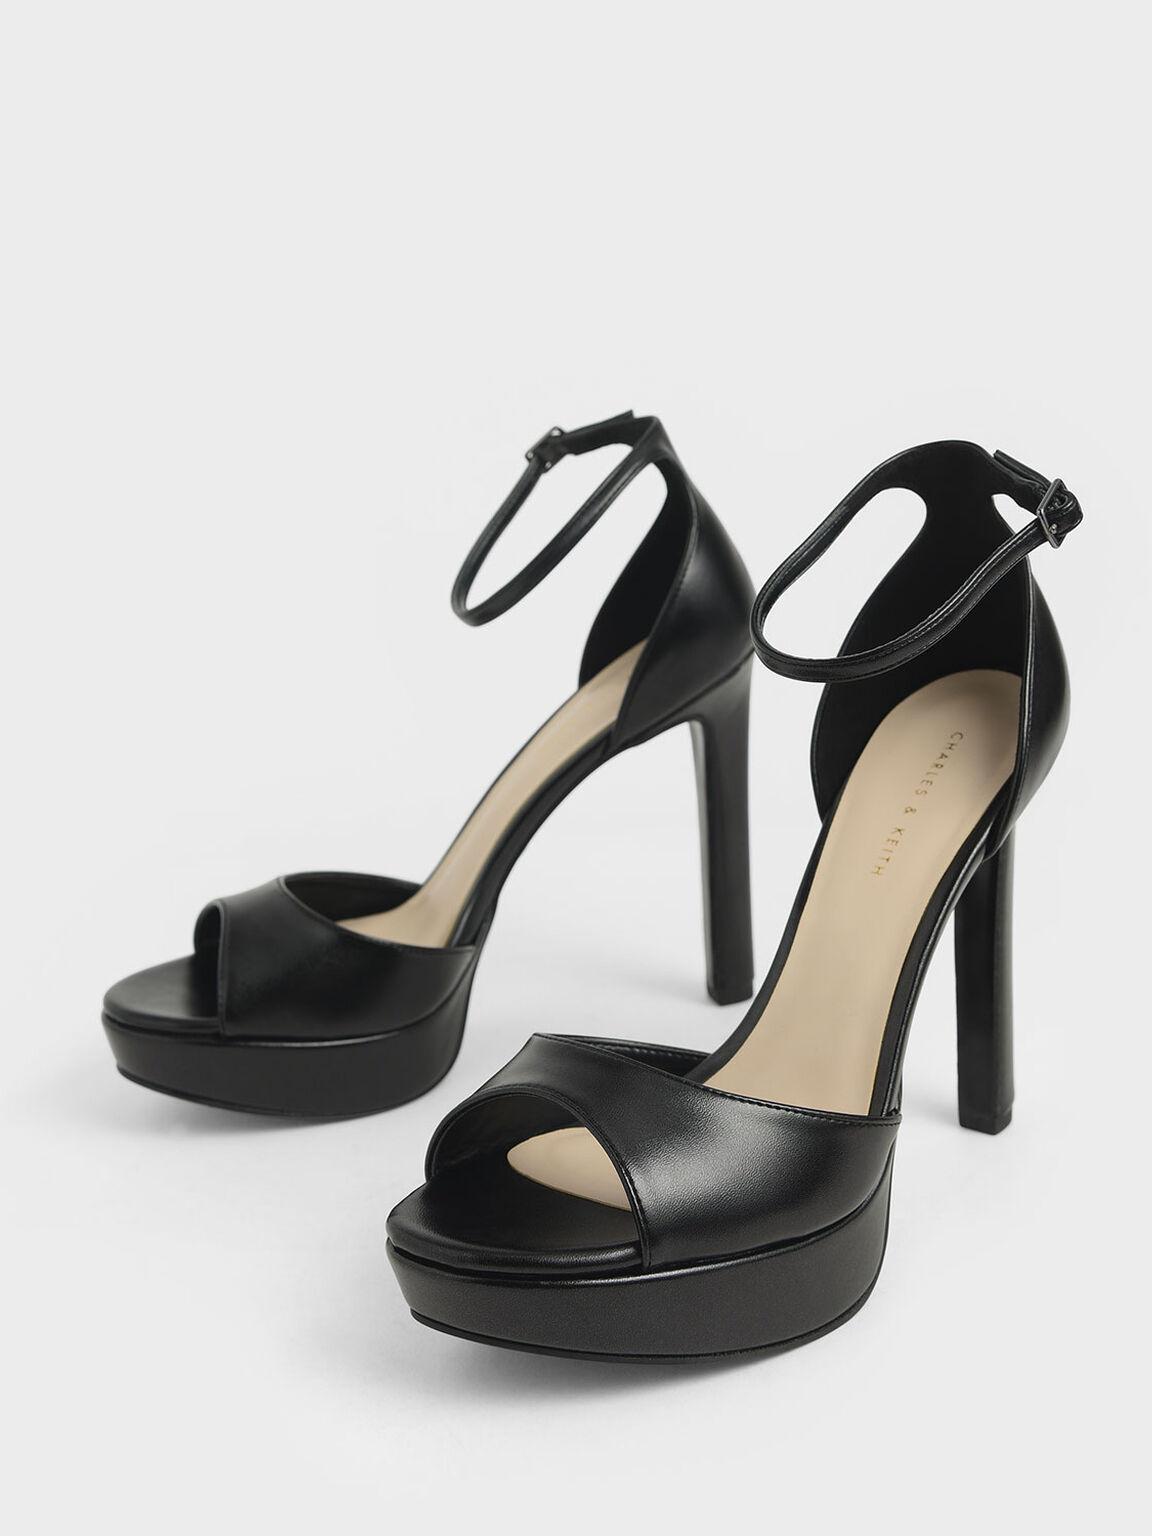 Metallic Platform Stiletto Heels, Black, hi-res